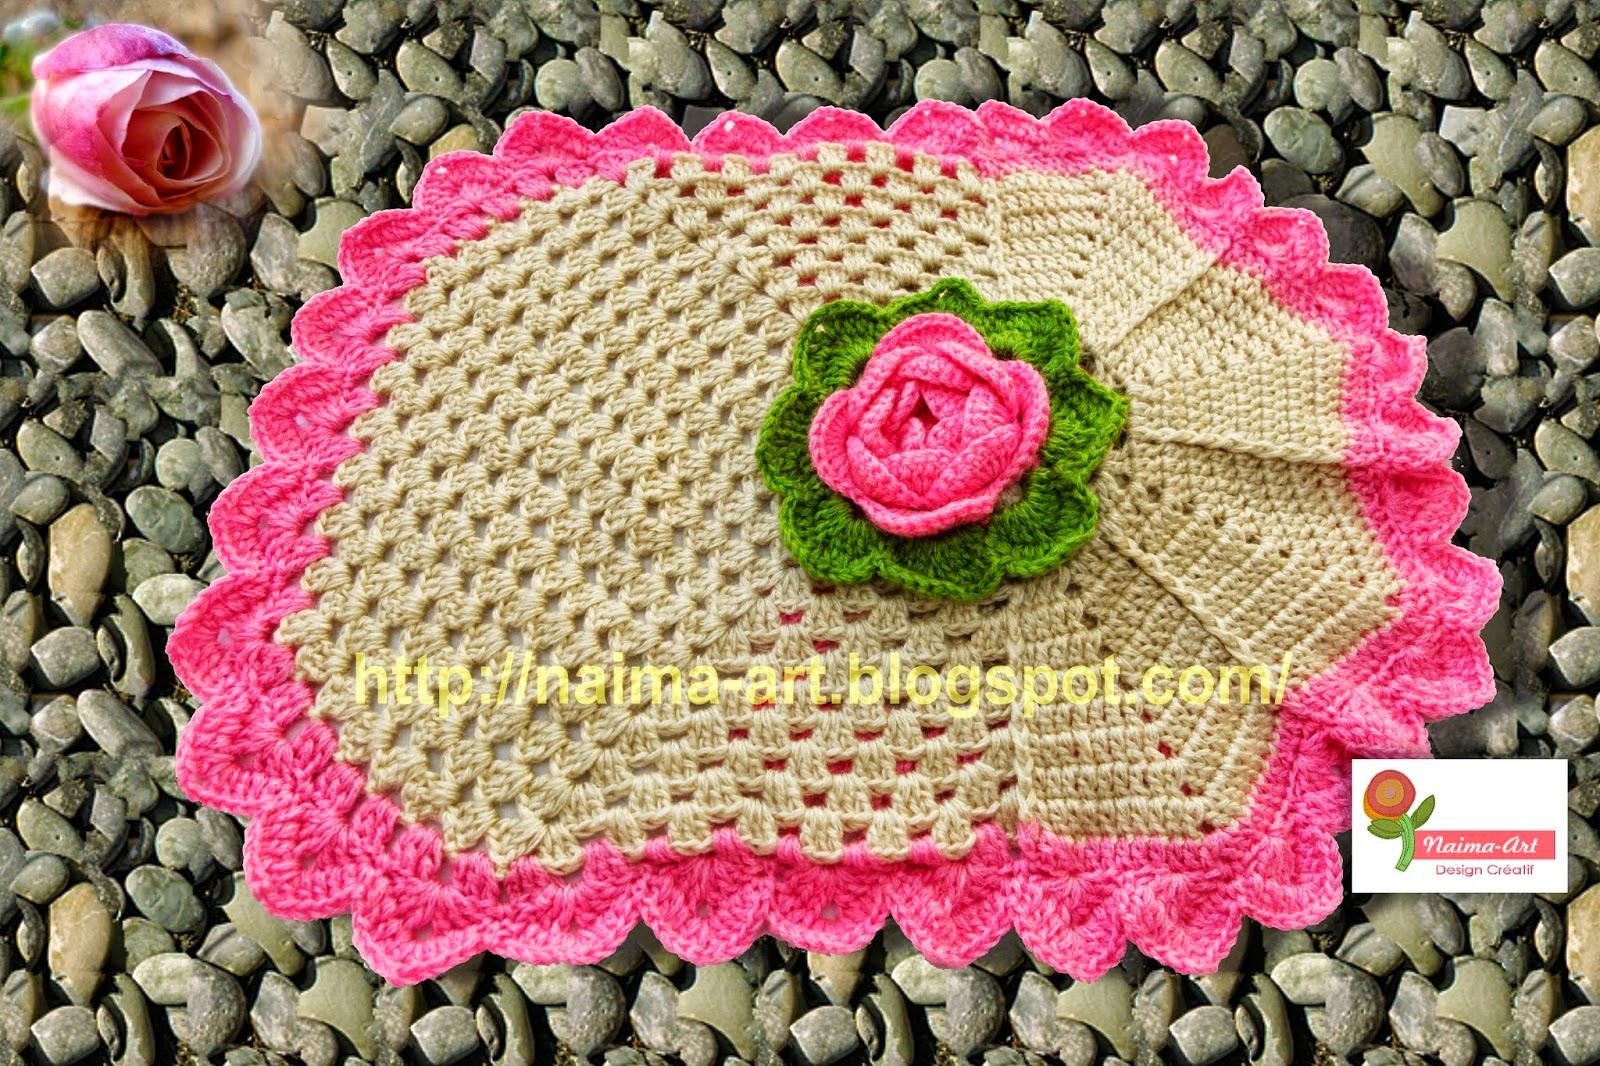 naima art crochet bathroom sets crochet pour salle de bain. Black Bedroom Furniture Sets. Home Design Ideas